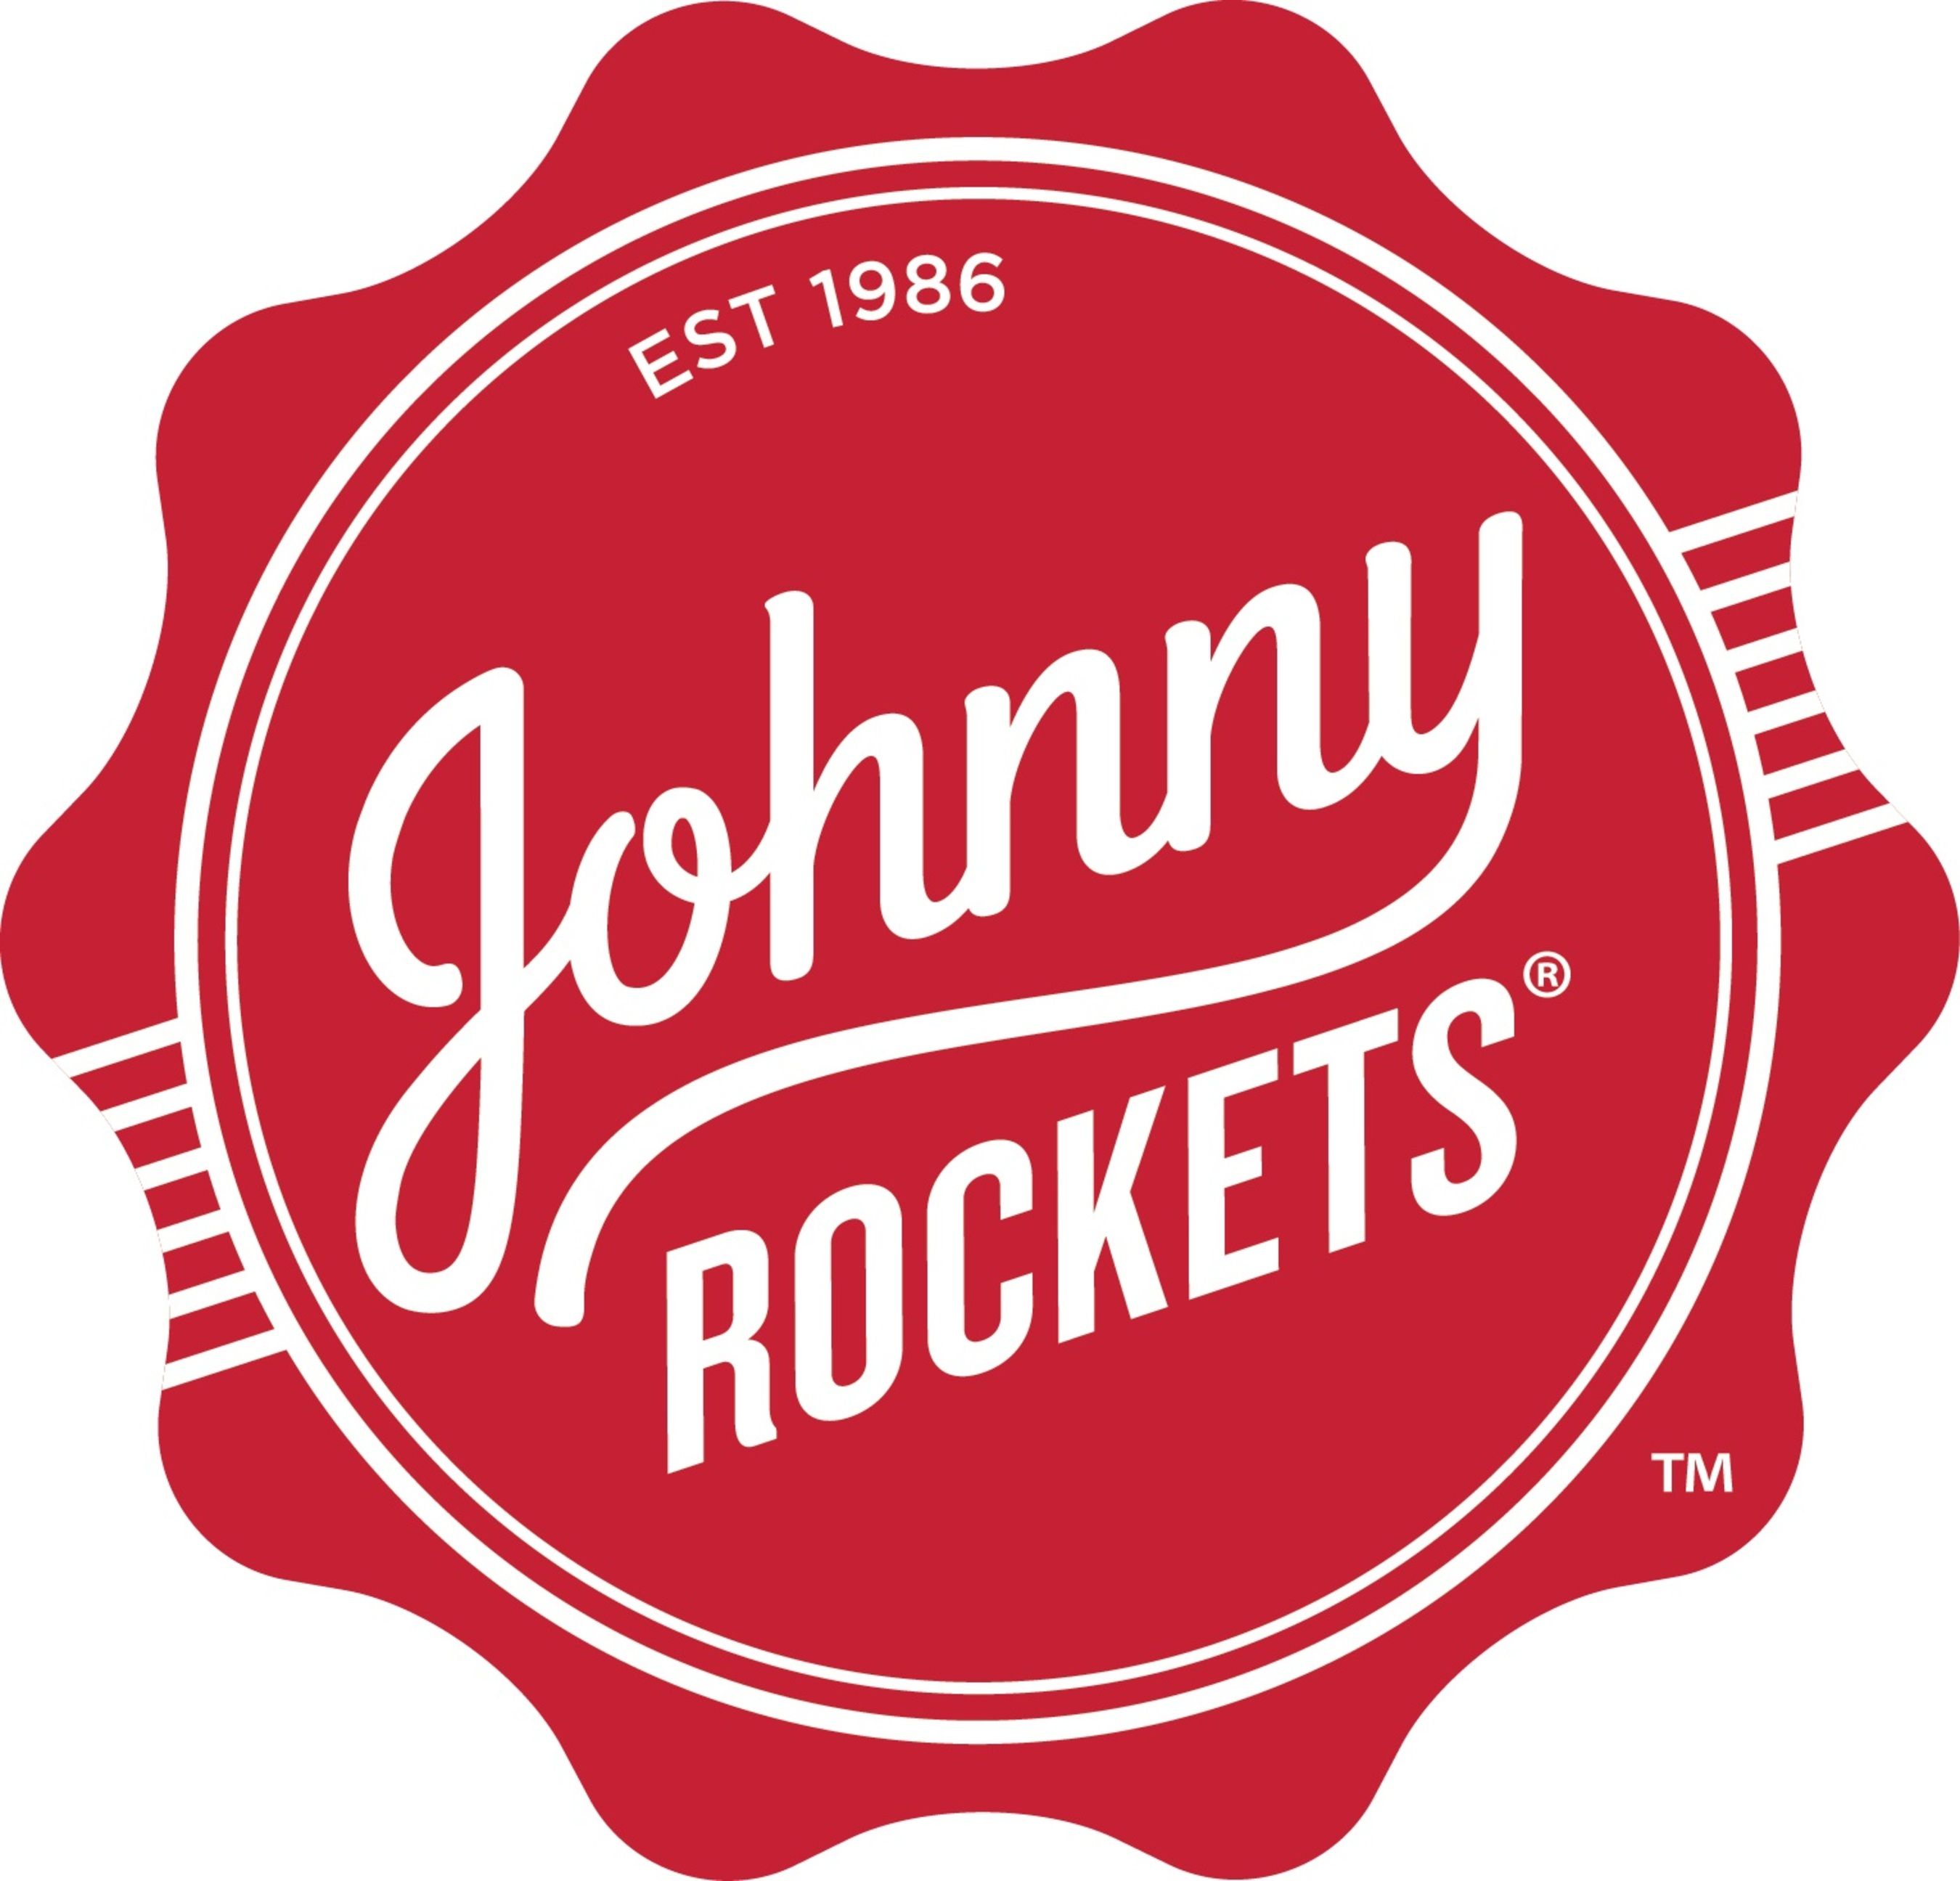 Johnny Rockets logo.